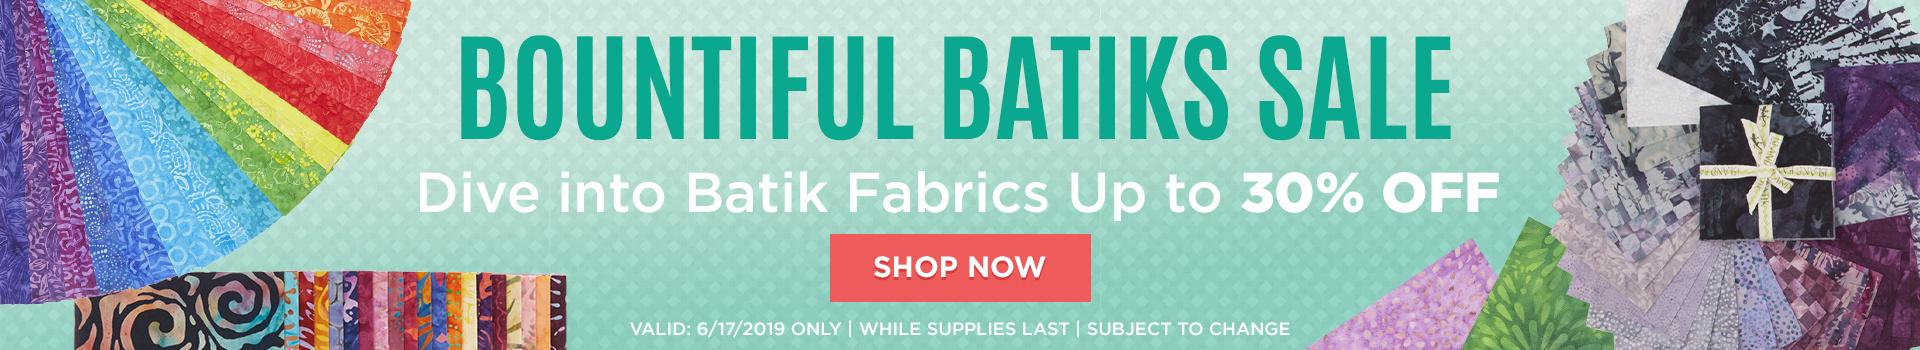 Batiks up to 30% off